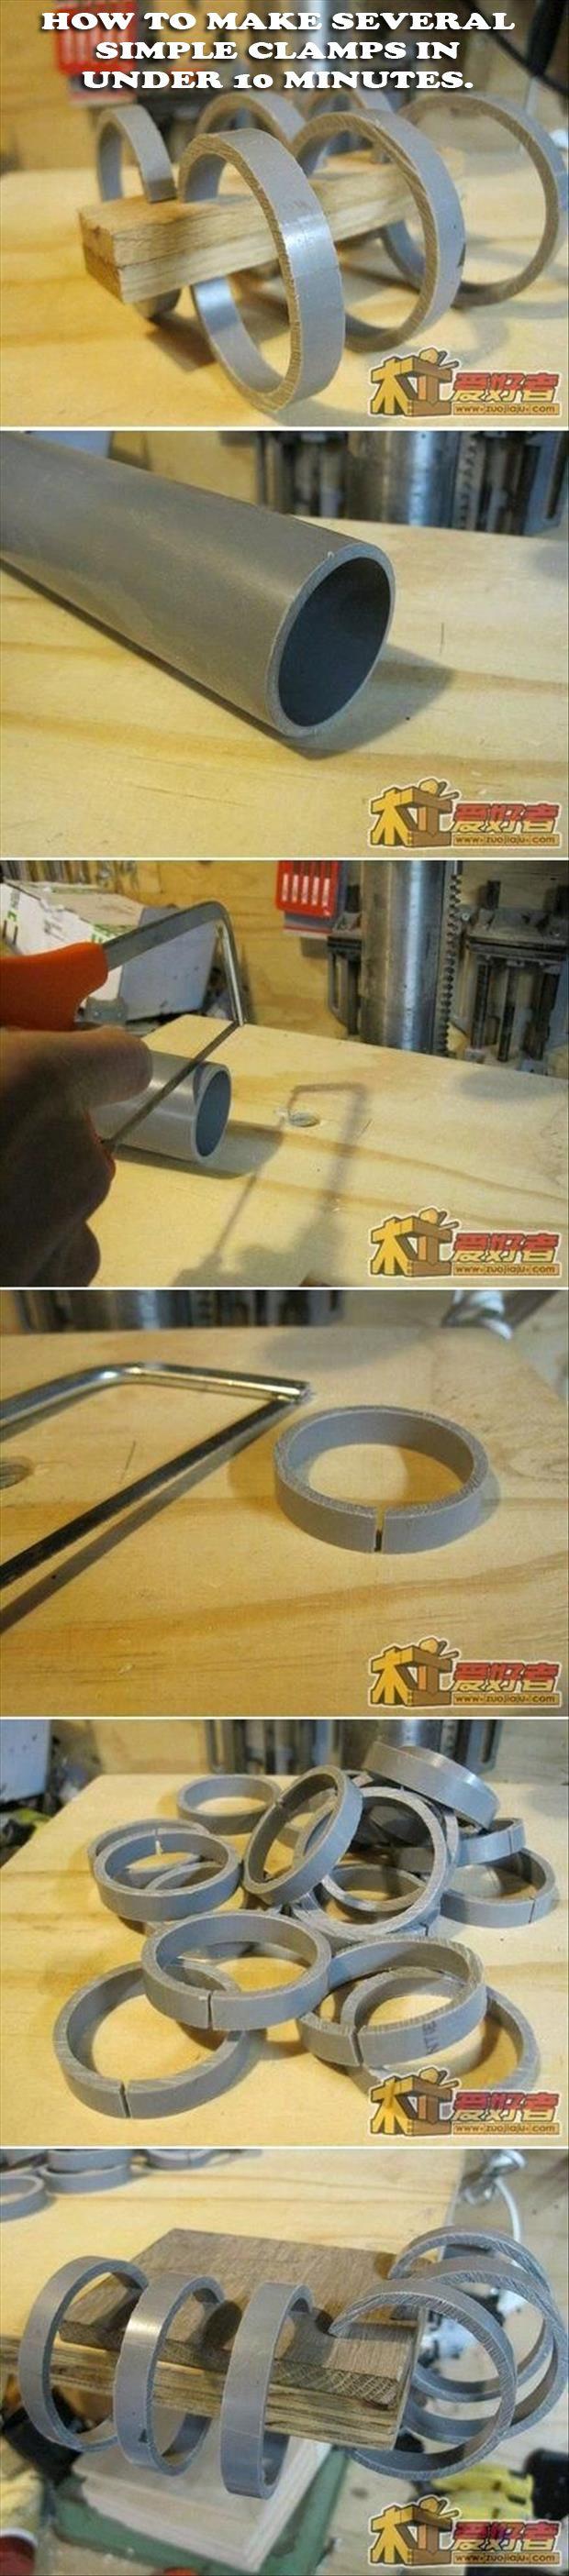 PVC clamps.